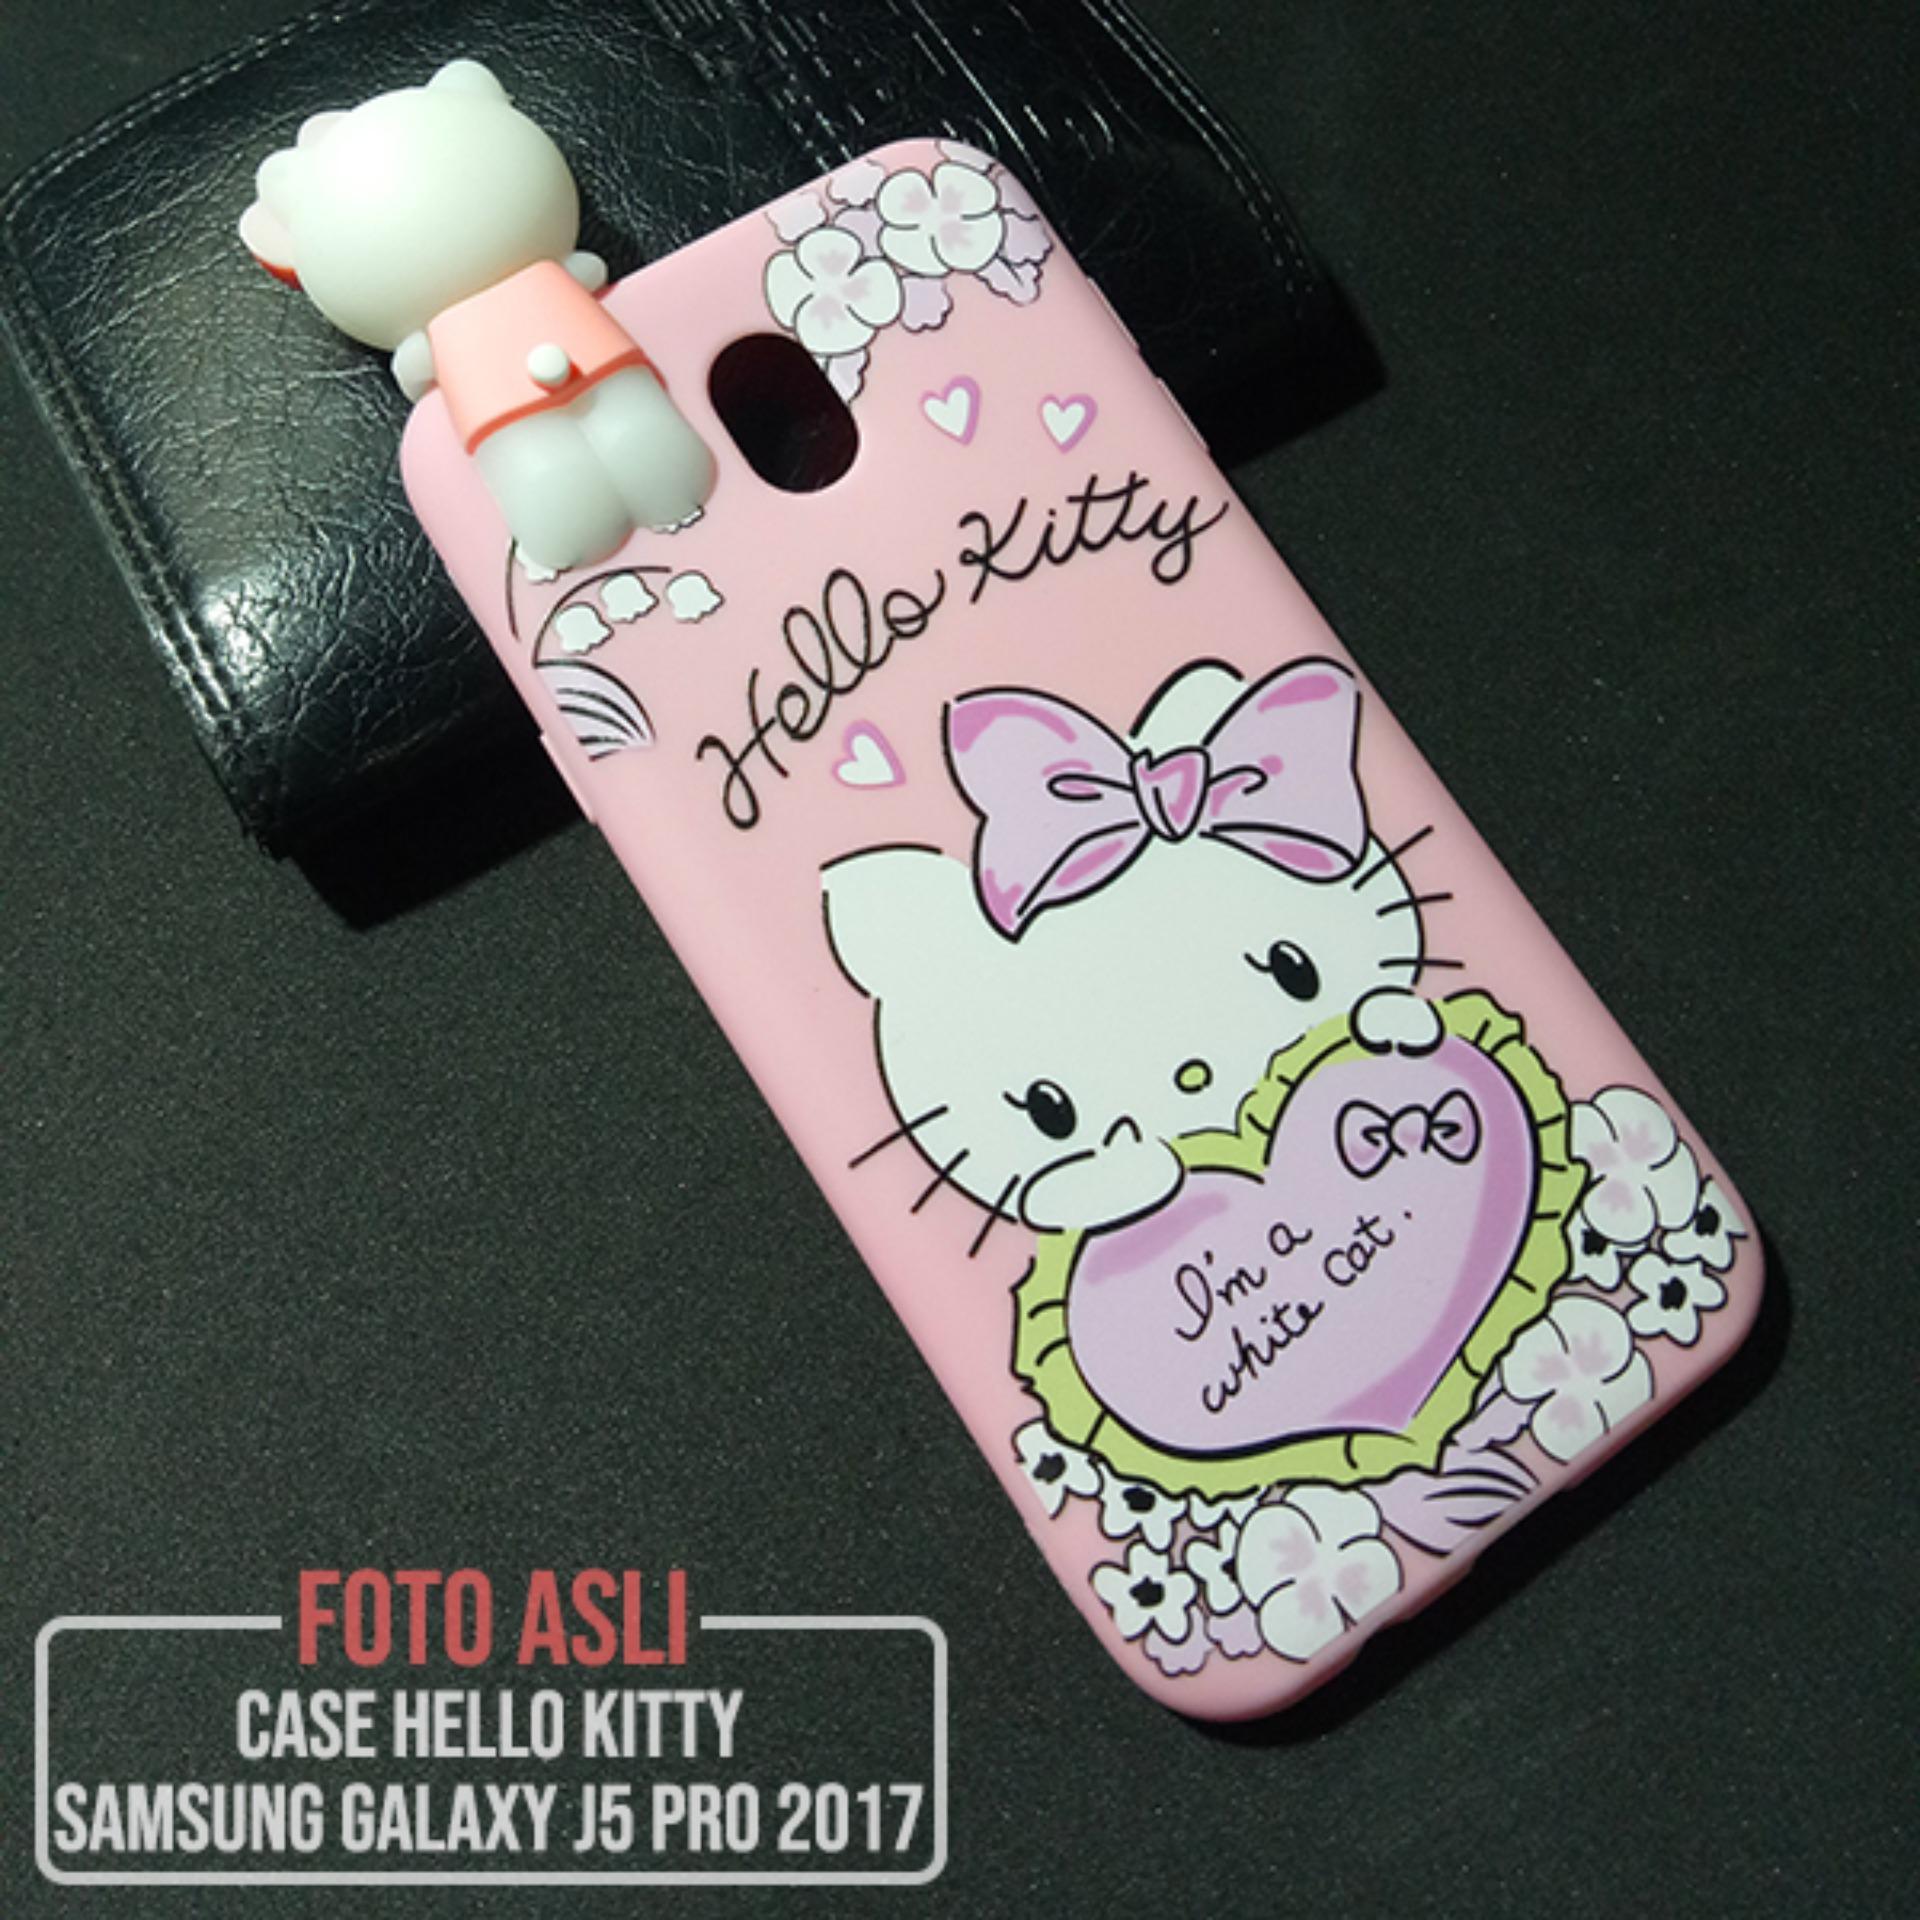 CASE SAMSUNG GALAXY J5 PRO / J530 BONEKA KARTUN KARAKTER HELLO KITTY CUTE 3D